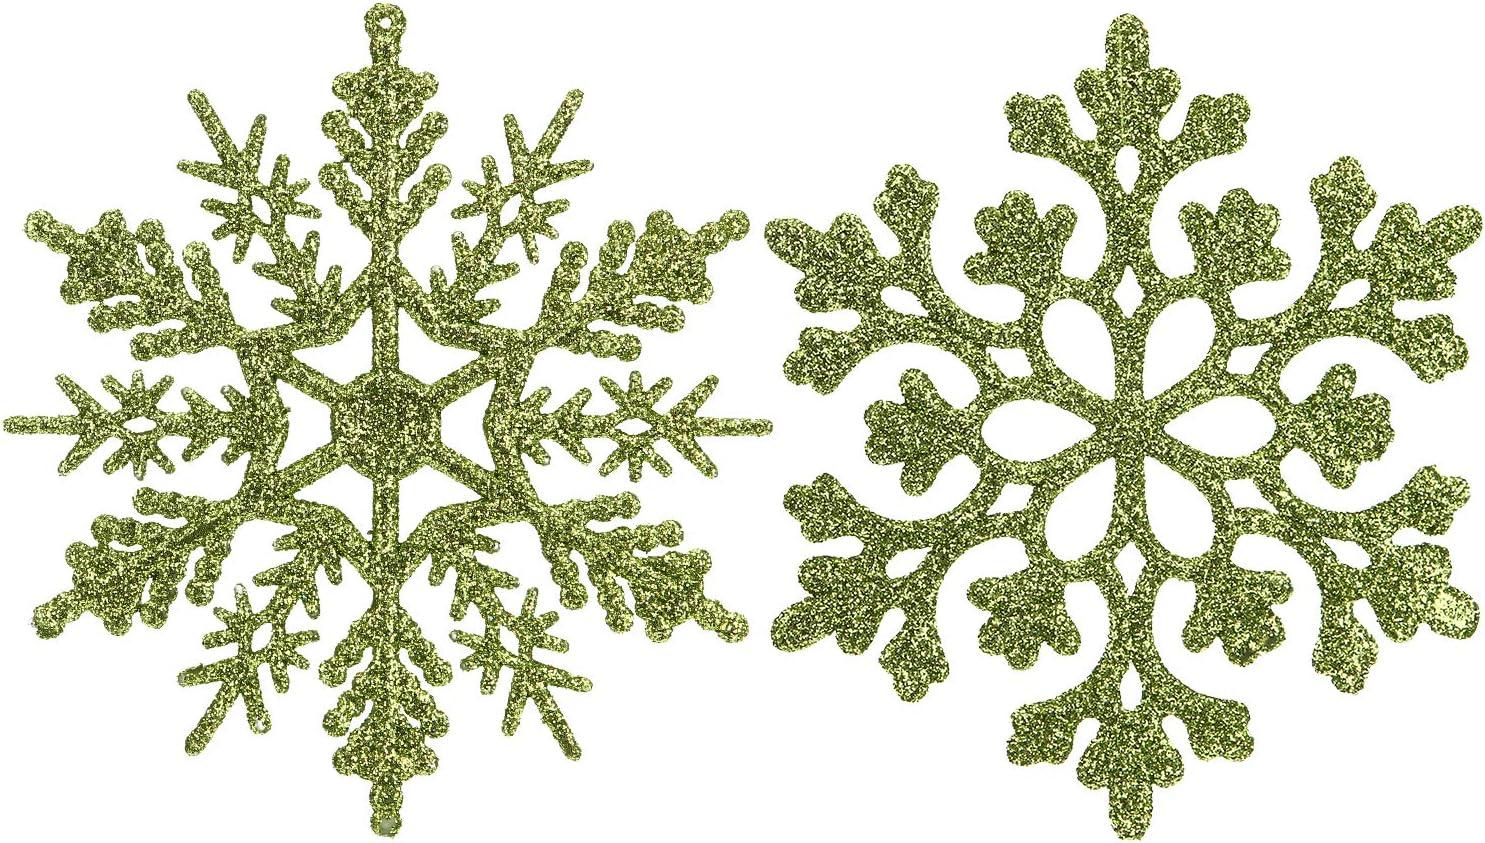 Sea Team Plastic Christmas Glitter Snowflake Ornaments Christmas Tree Decorations, 4-inch, Set of 36, Lime